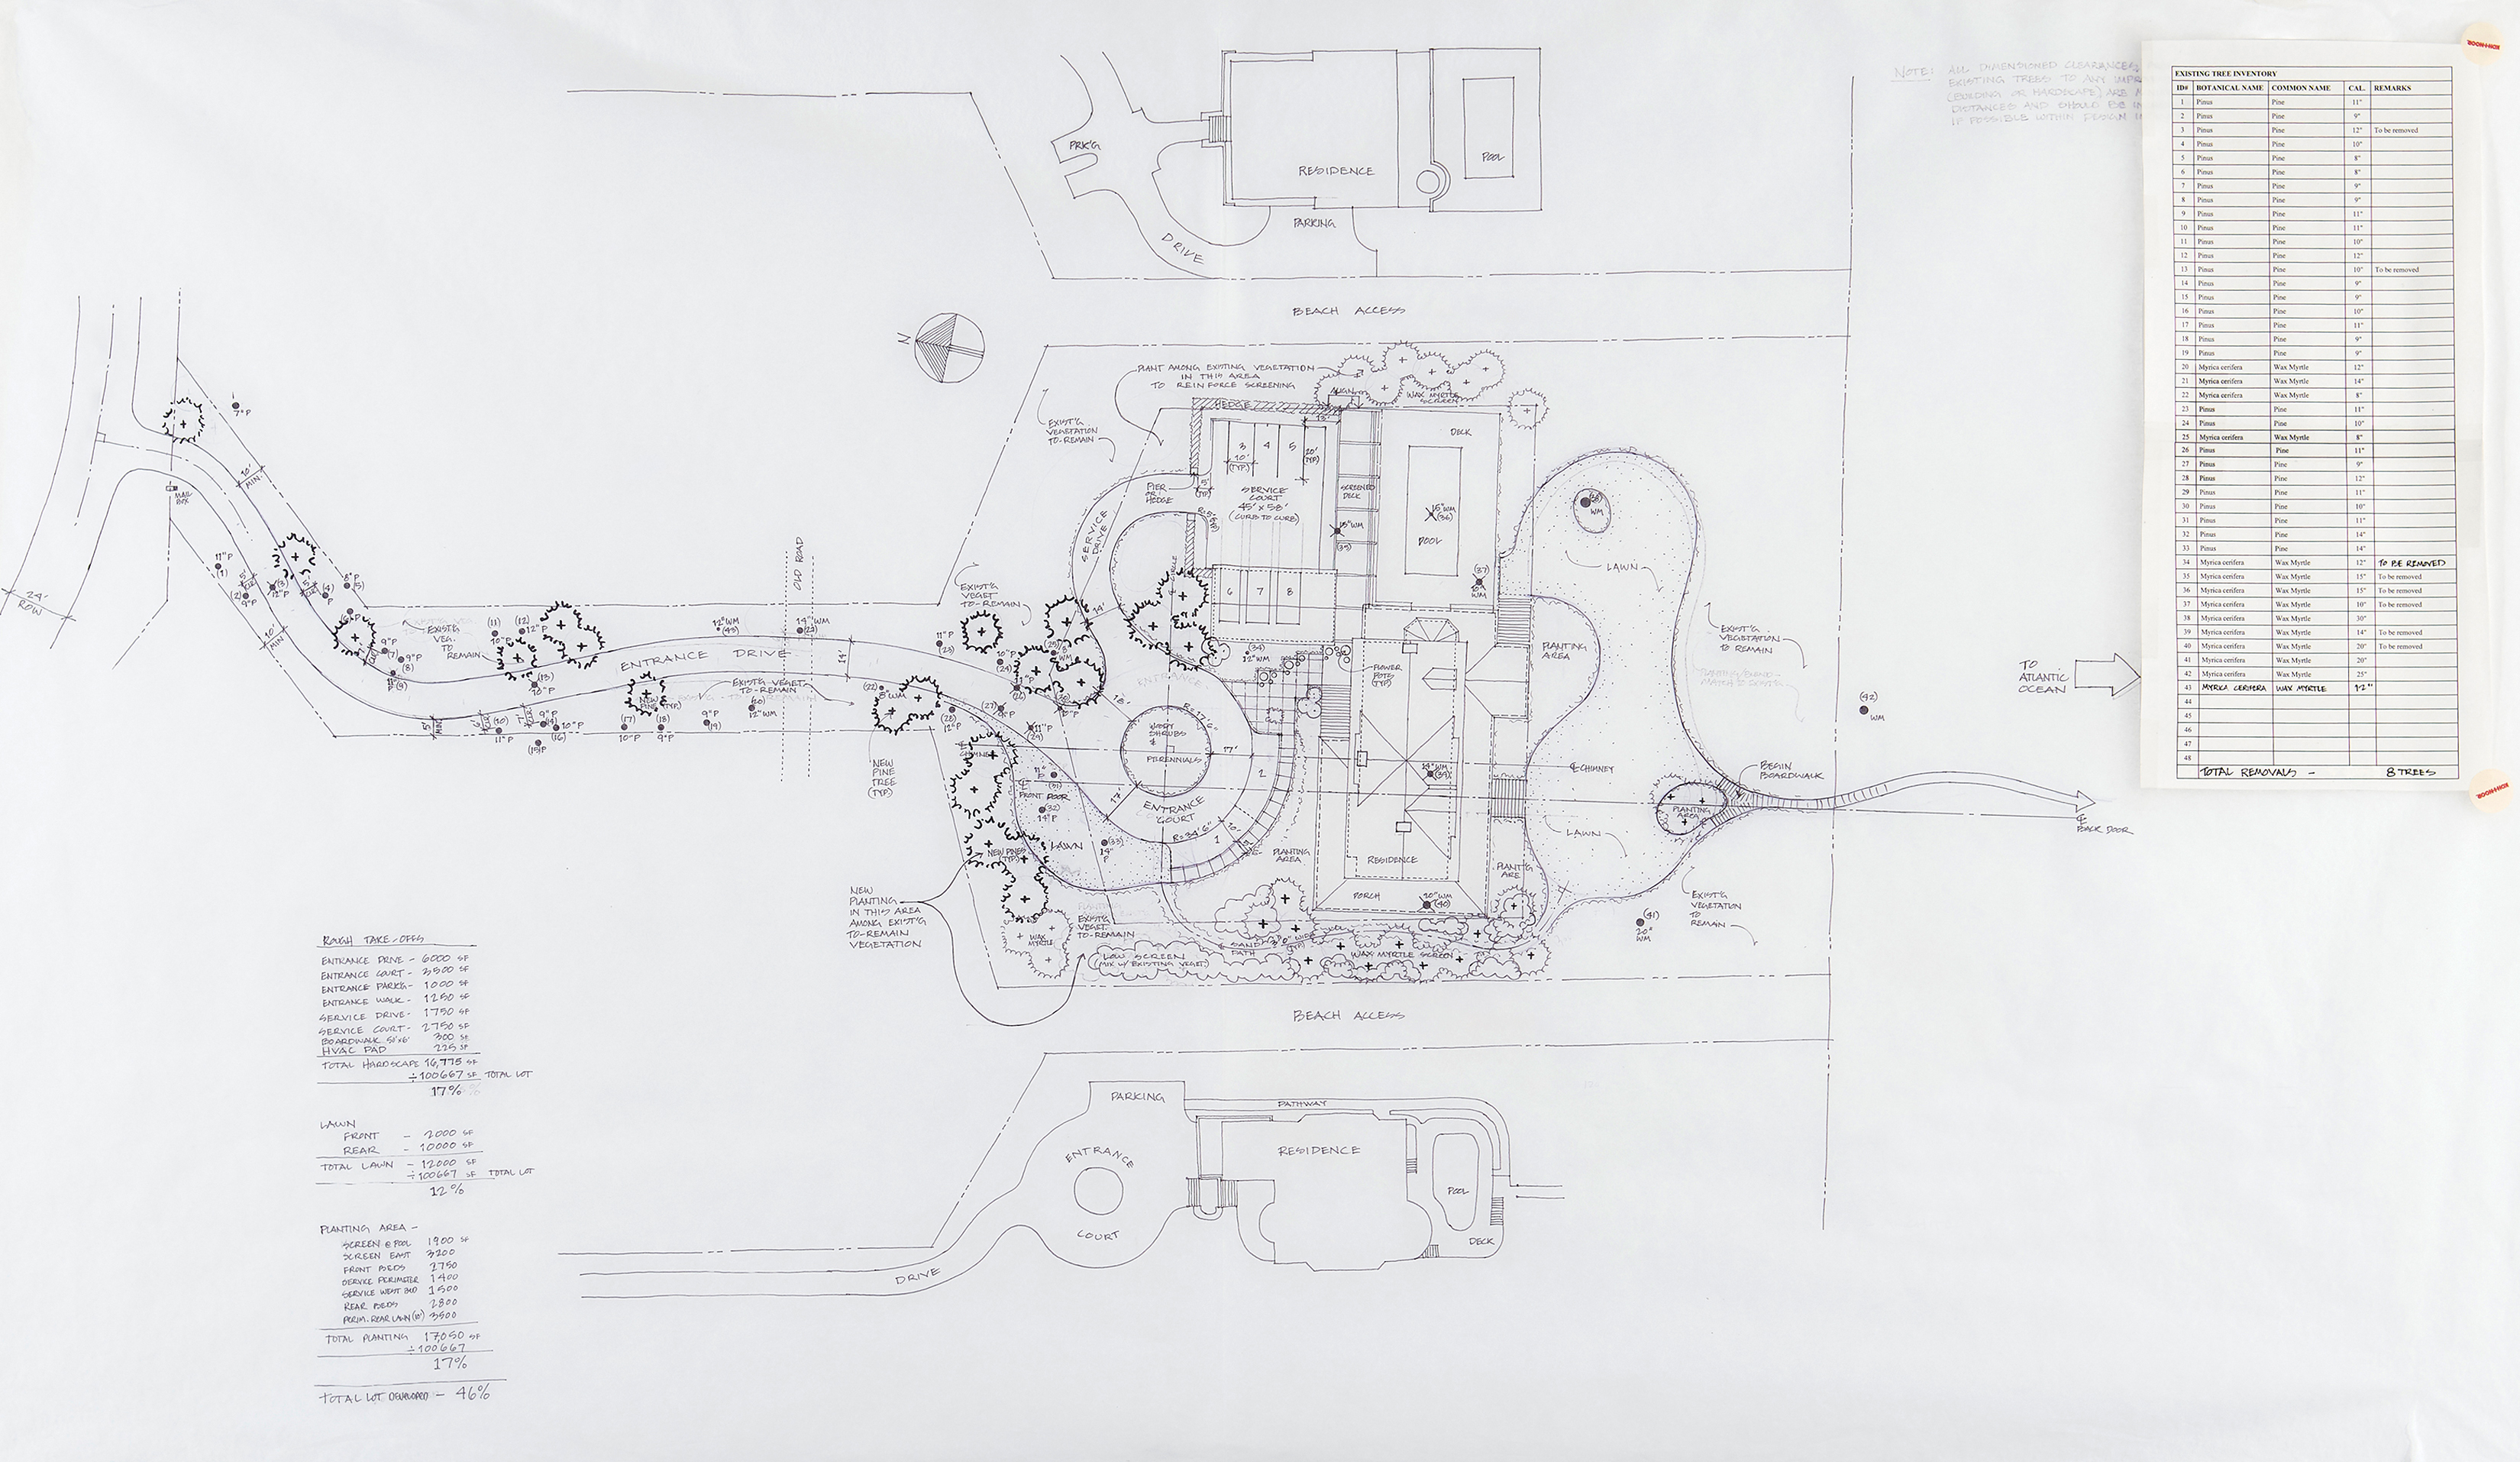 <p><span><span><span><span>Site plan of the original house. Drawing 1999. </span></span></span></span></p>